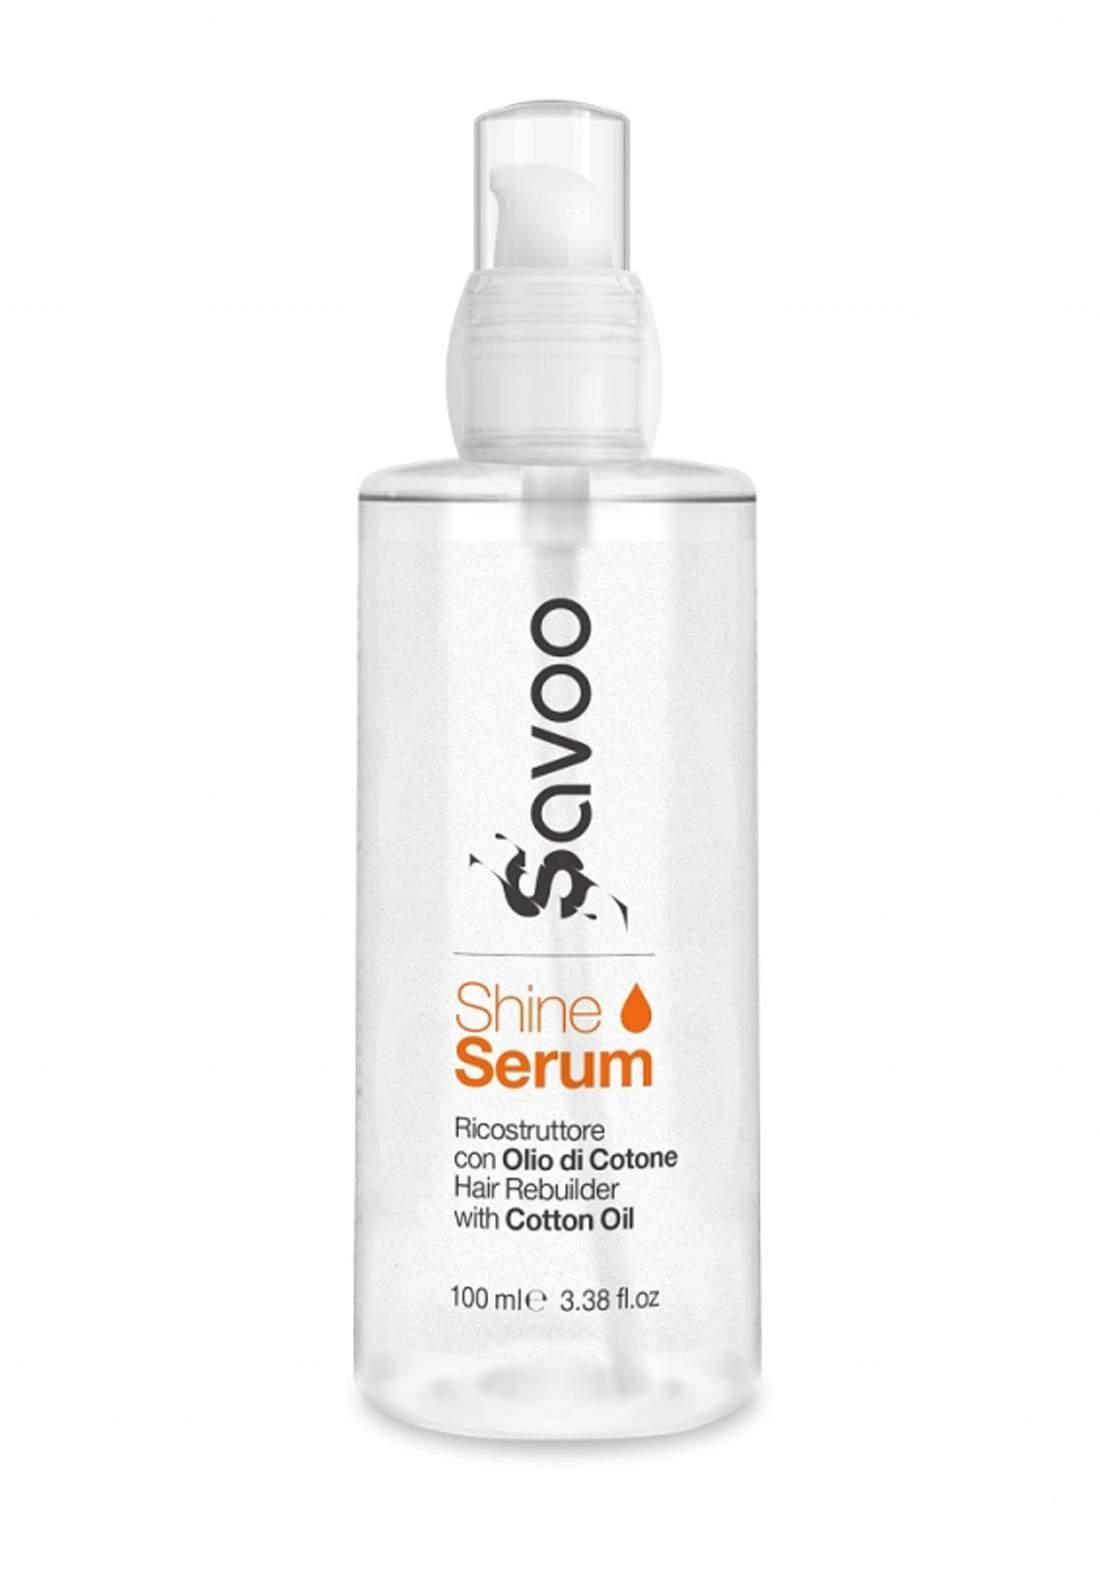 Savoo Shine Serum Ricostruttore for Hair 100ml سيرم للشعر